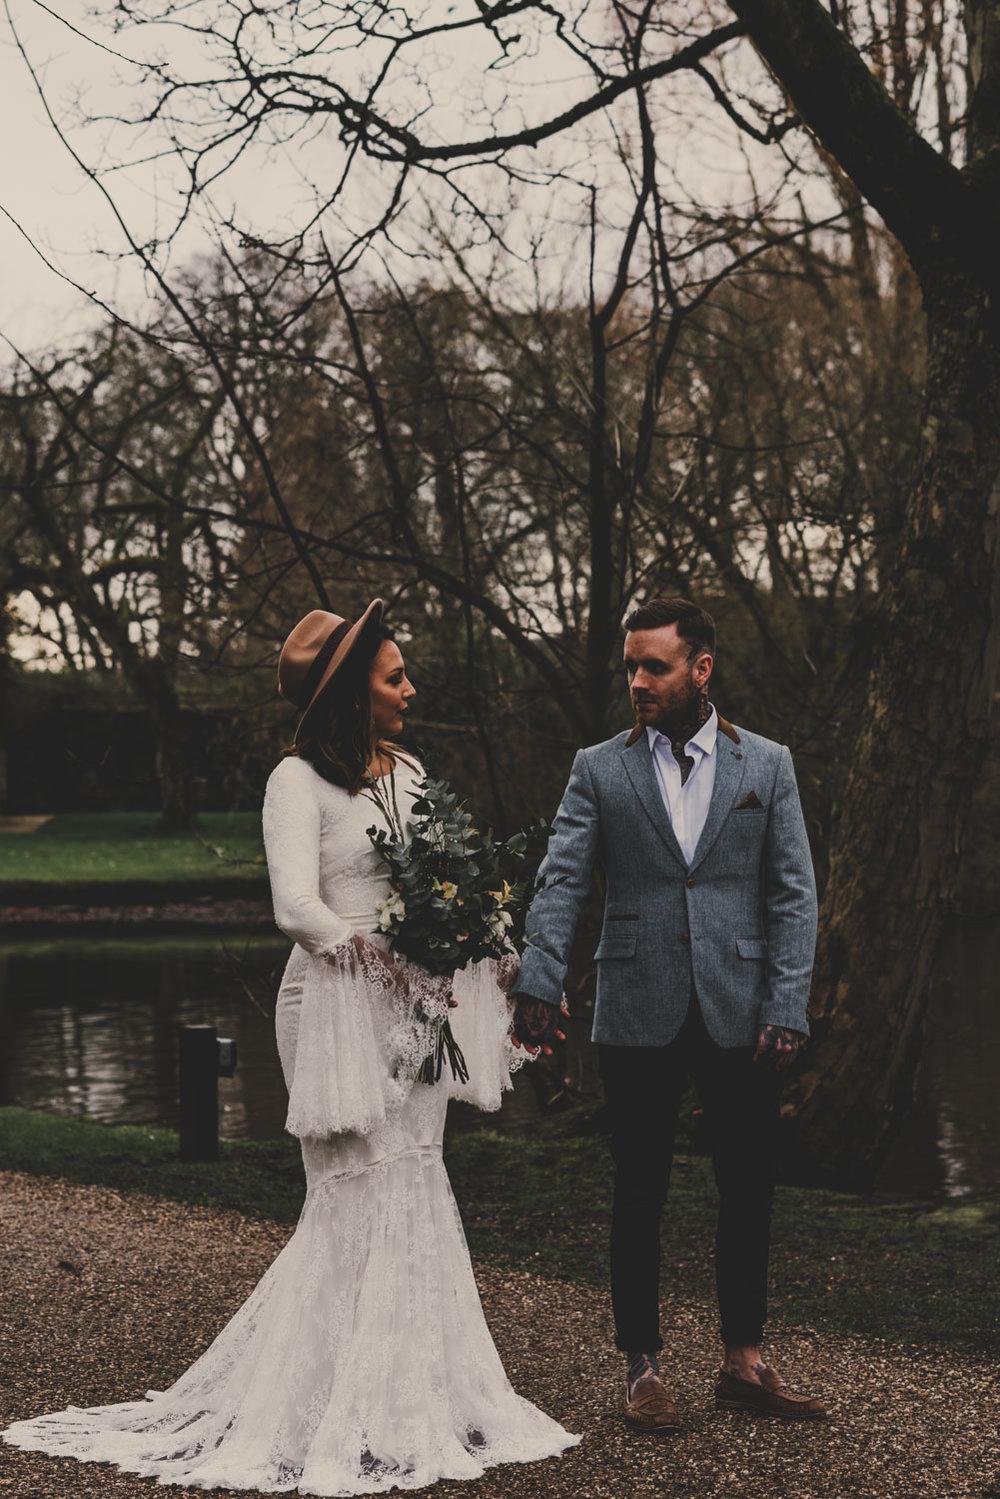 east-riddlesden-hall-wedding-jade-maguire-photography (49).jpg